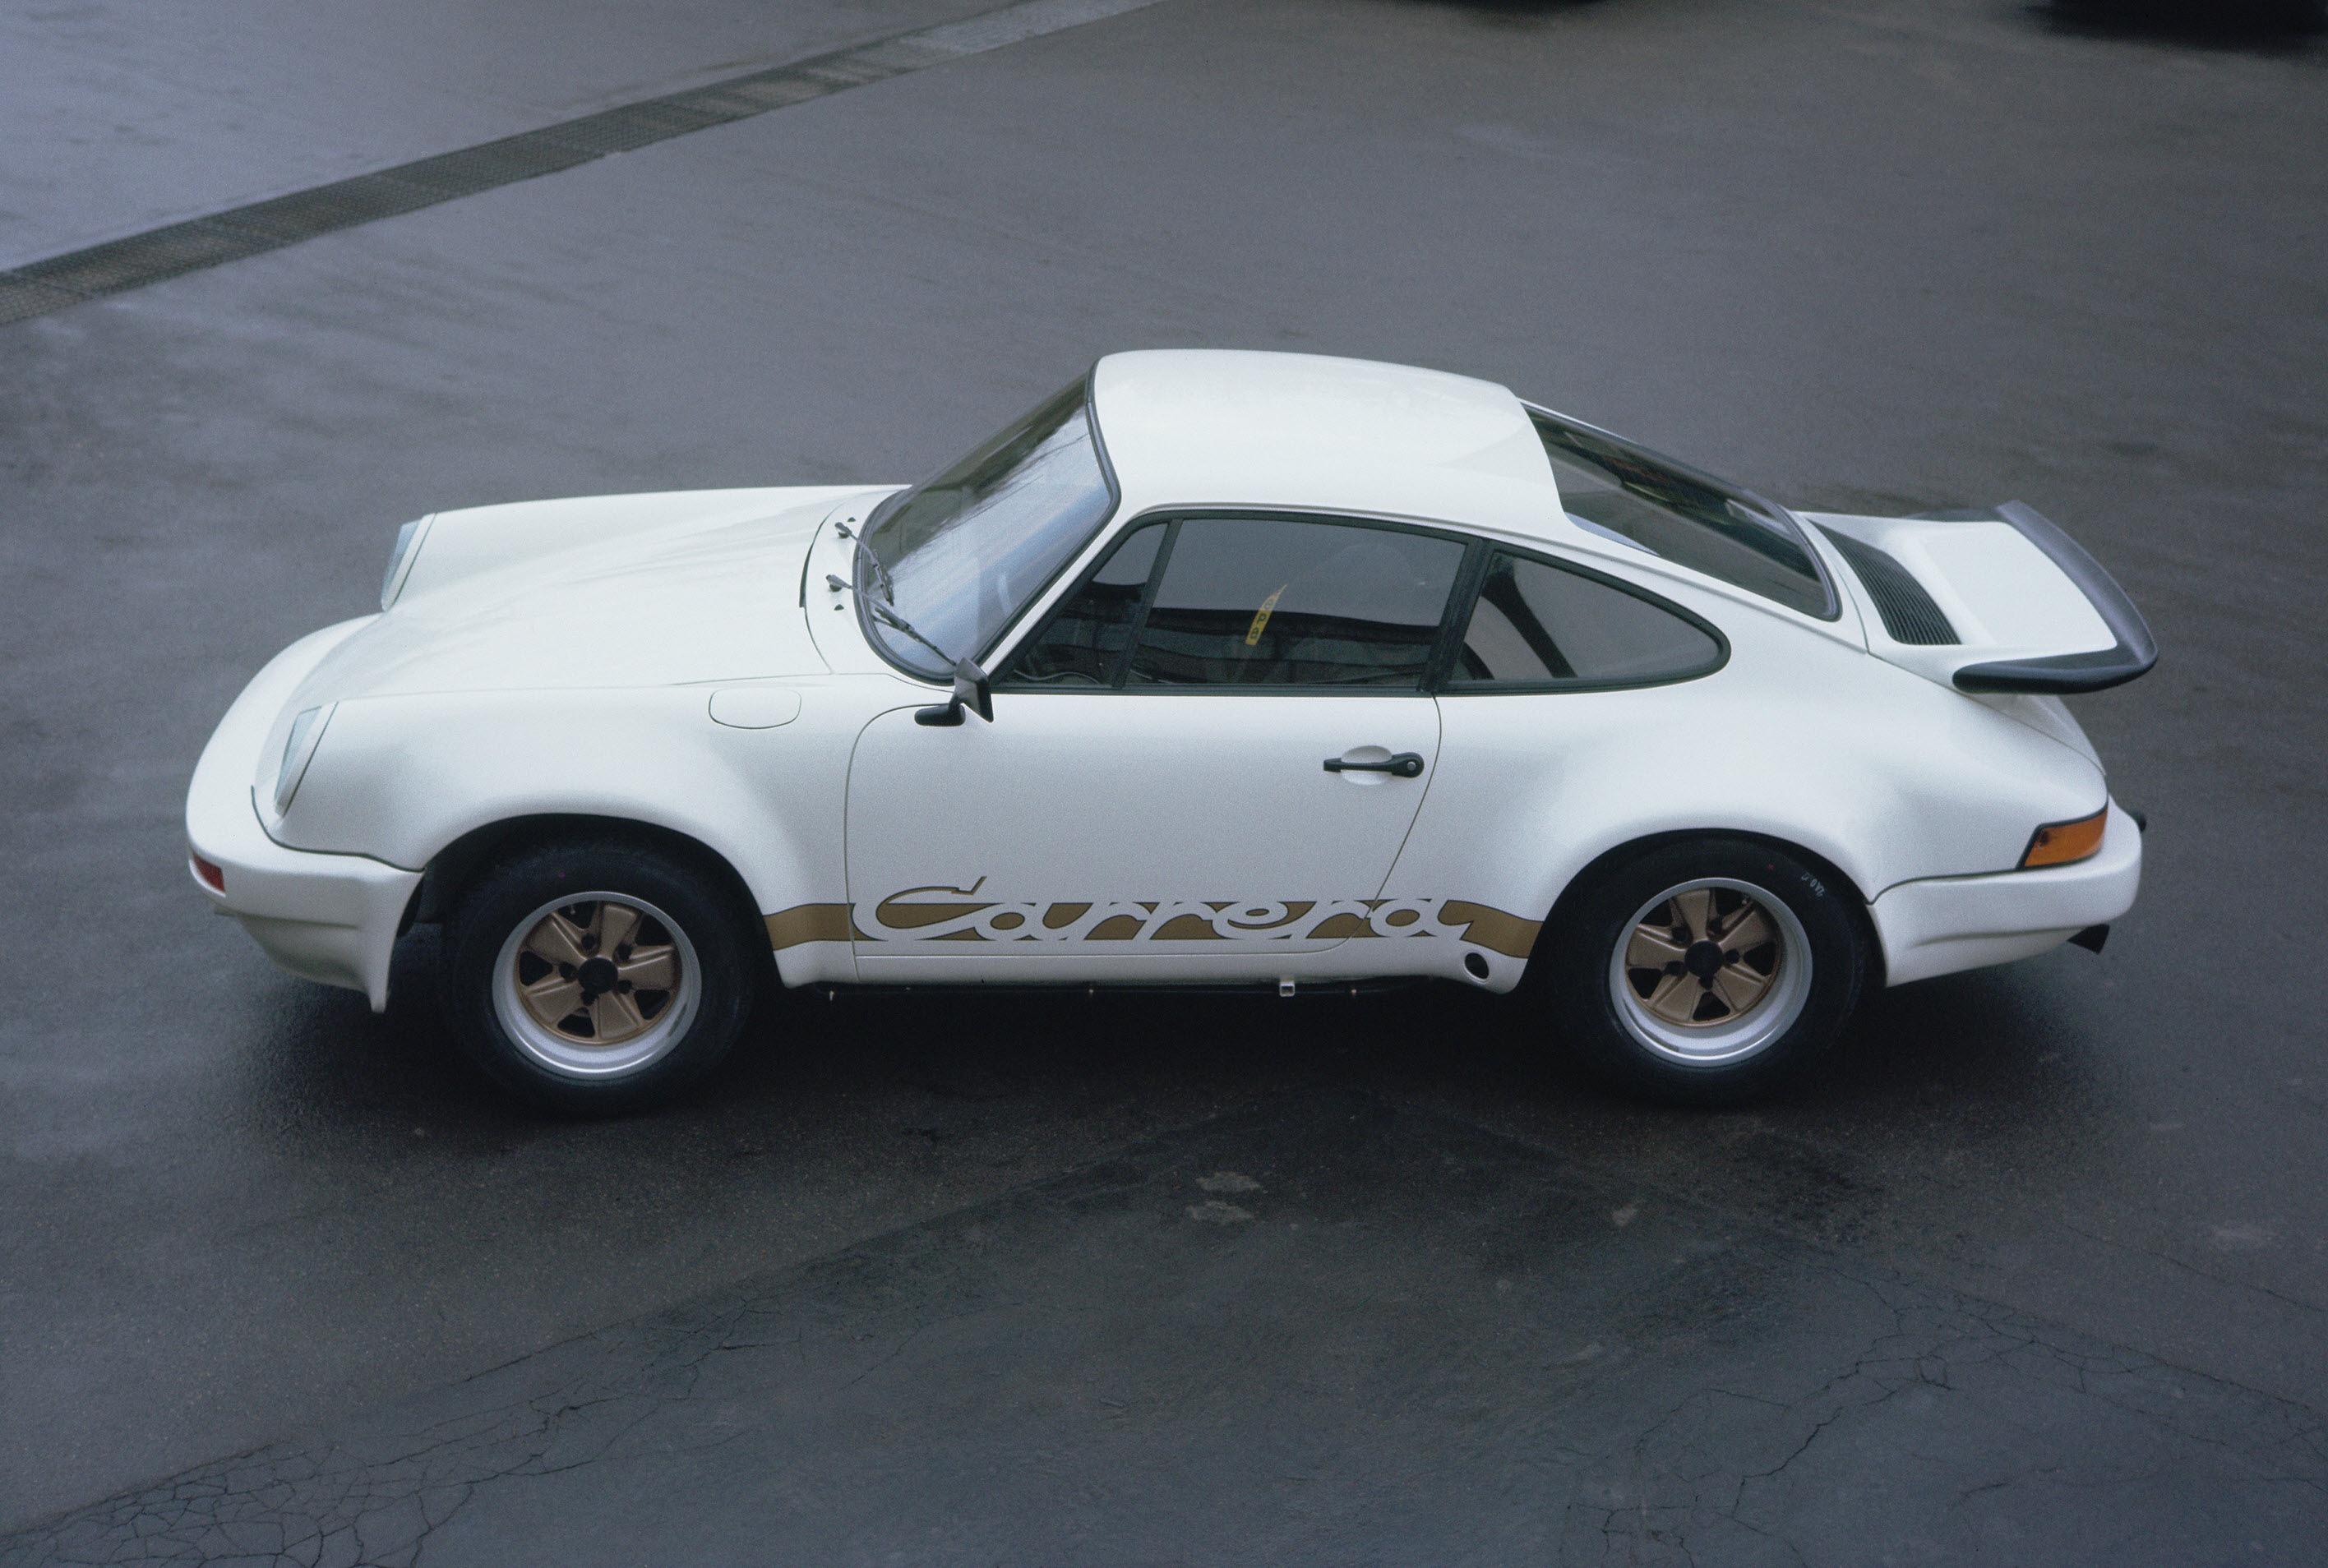 Porsche 1974 911 Carrera RS 3.0